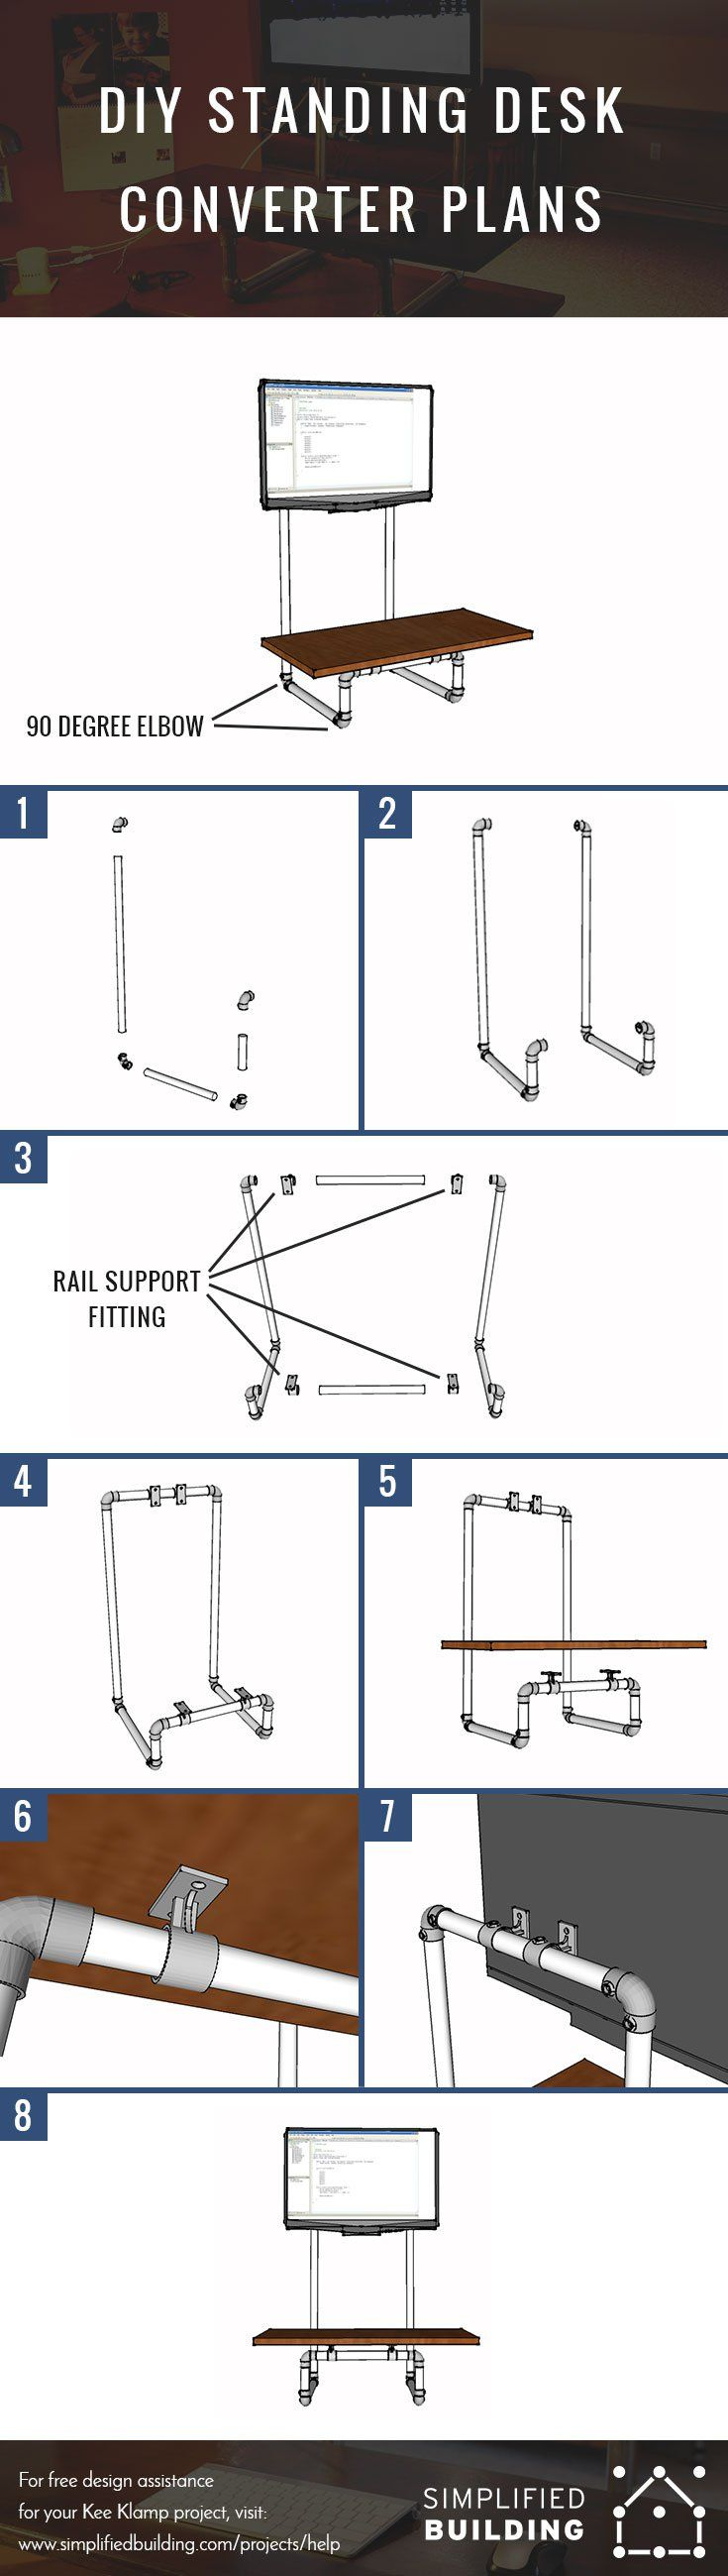 Diy standing desk plans - Diy Standing Desk Converter Step By Step Plans Keeklamp Diy